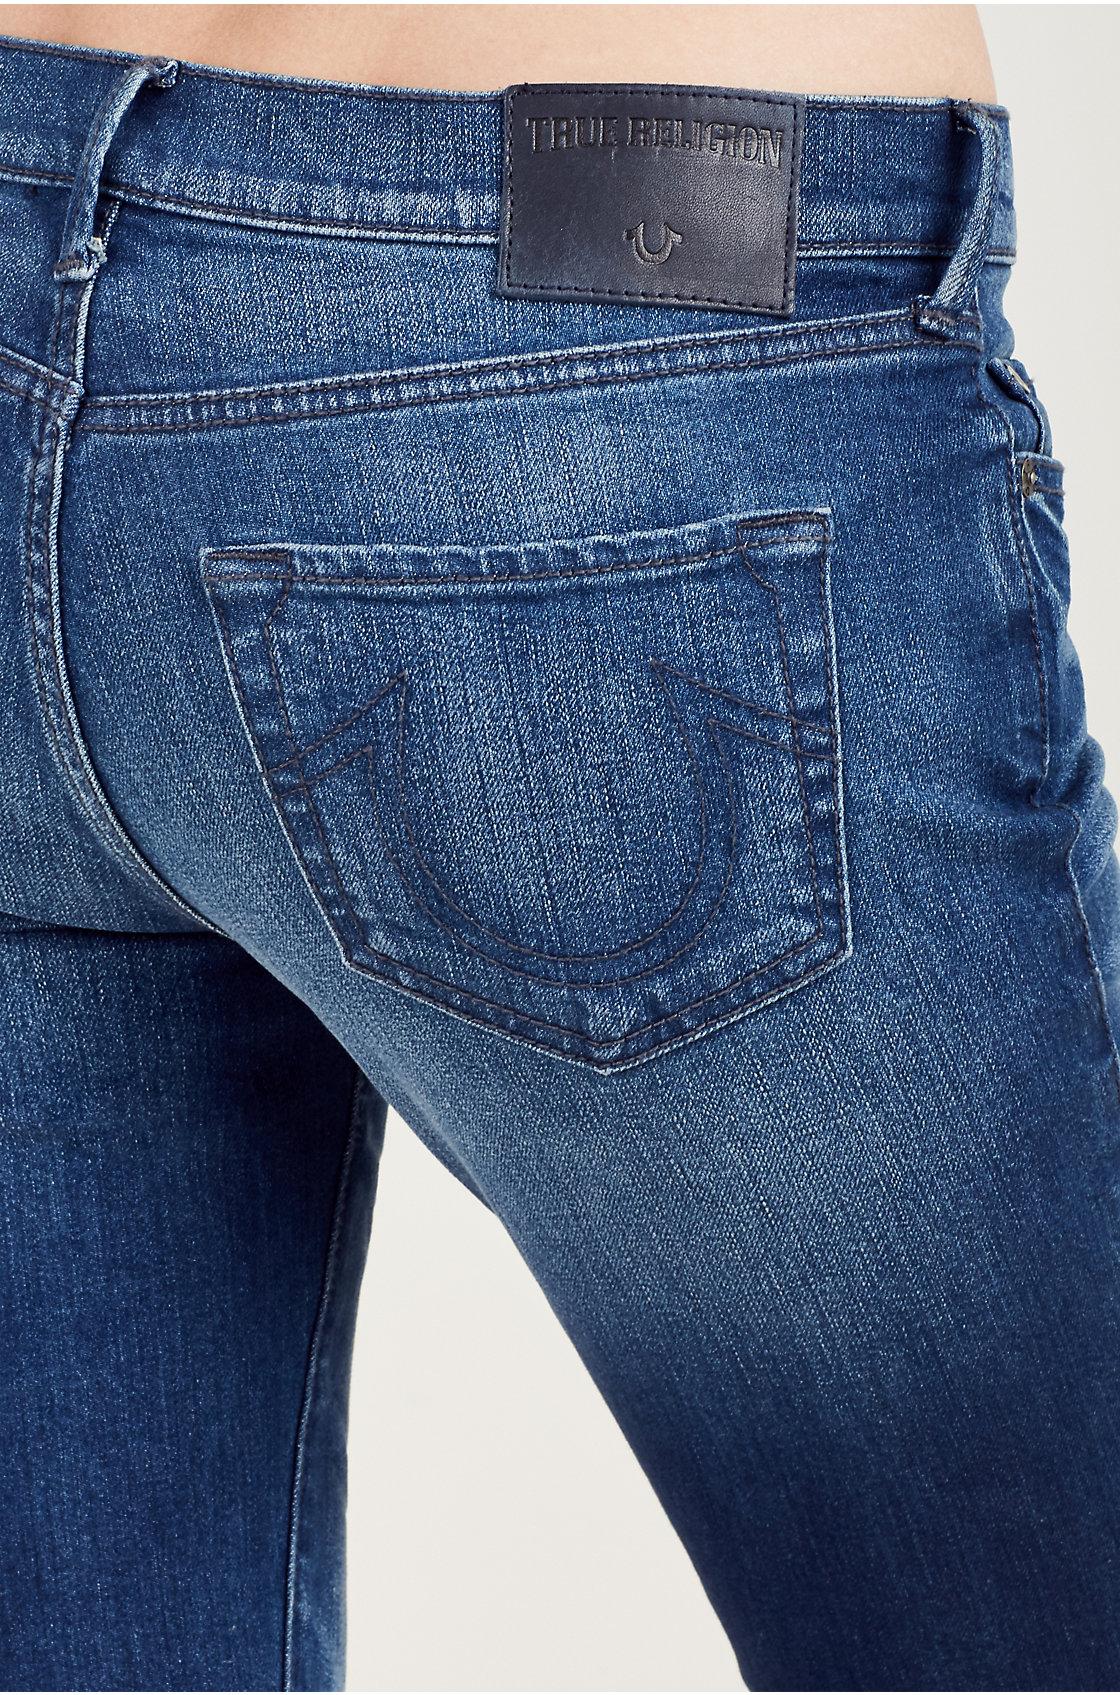 True-Religion-Women-039-s-Becca-Mid-Rise-Bootcut-Jeans thumbnail 5